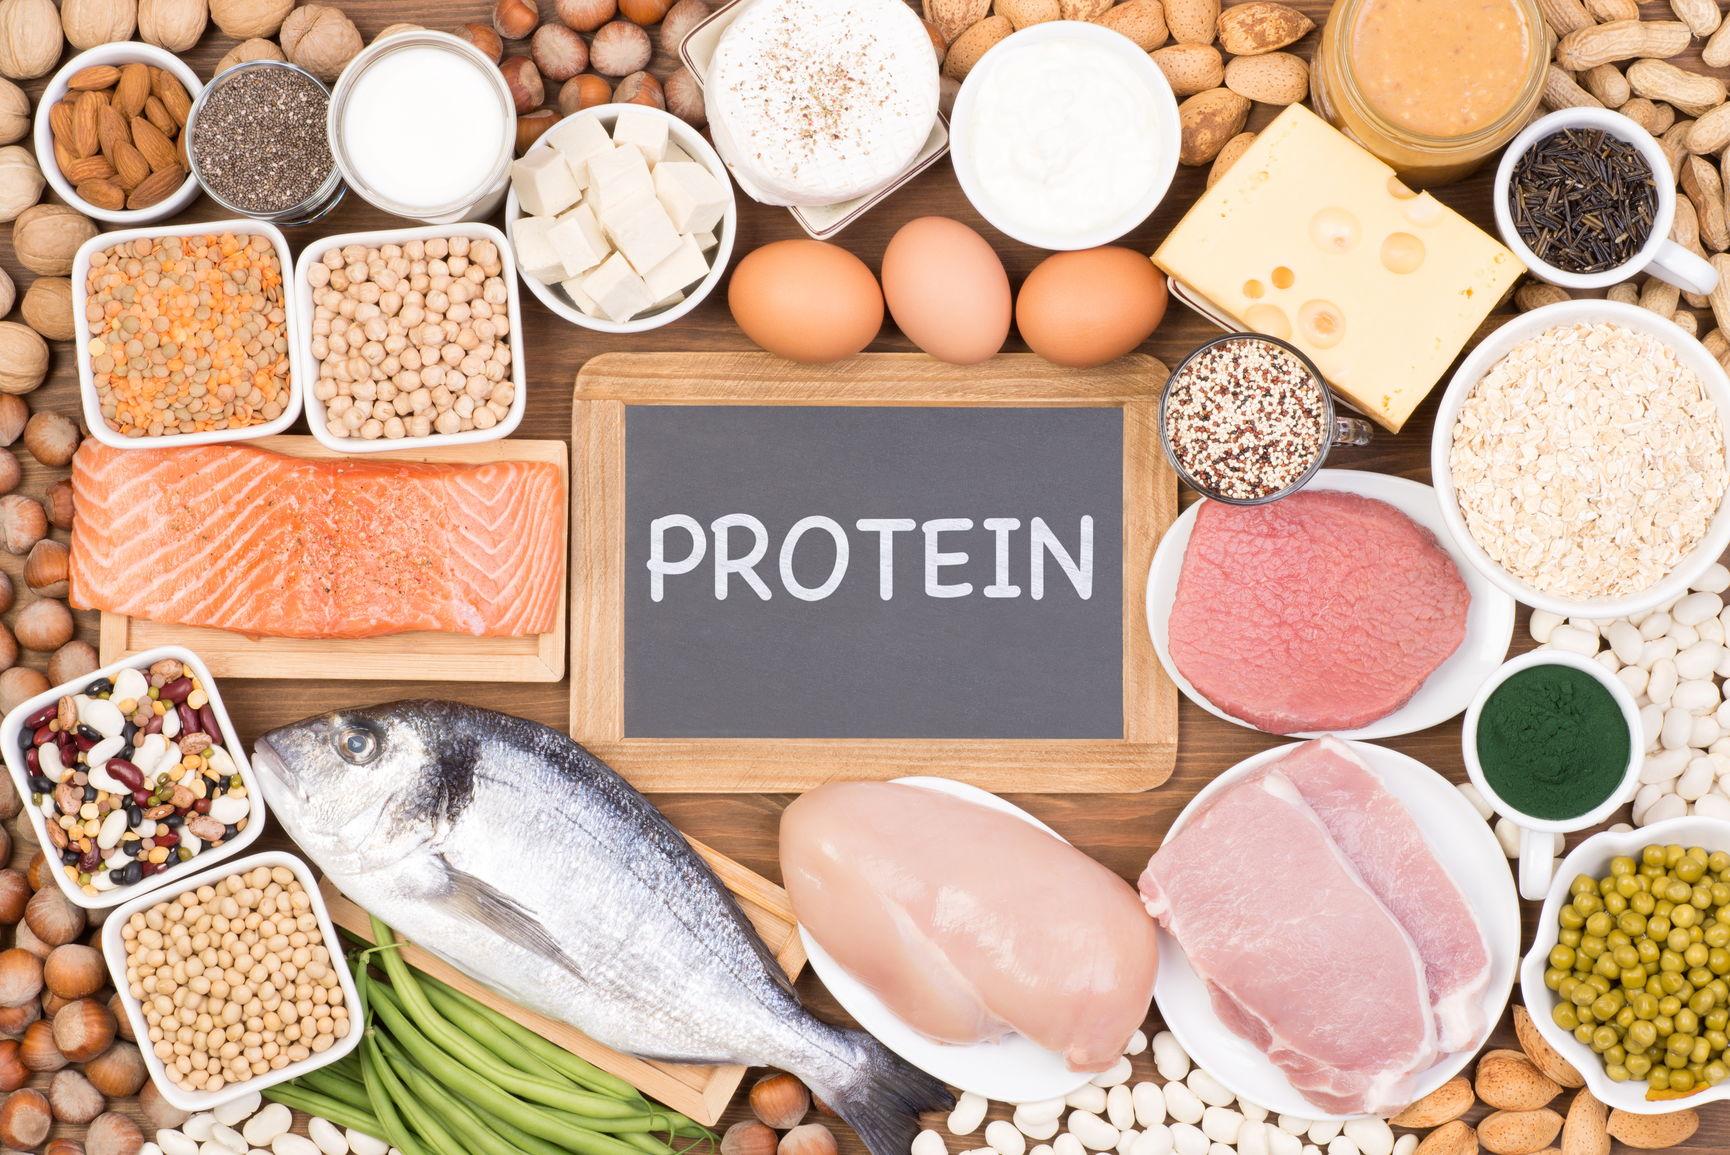 mat med mest protein